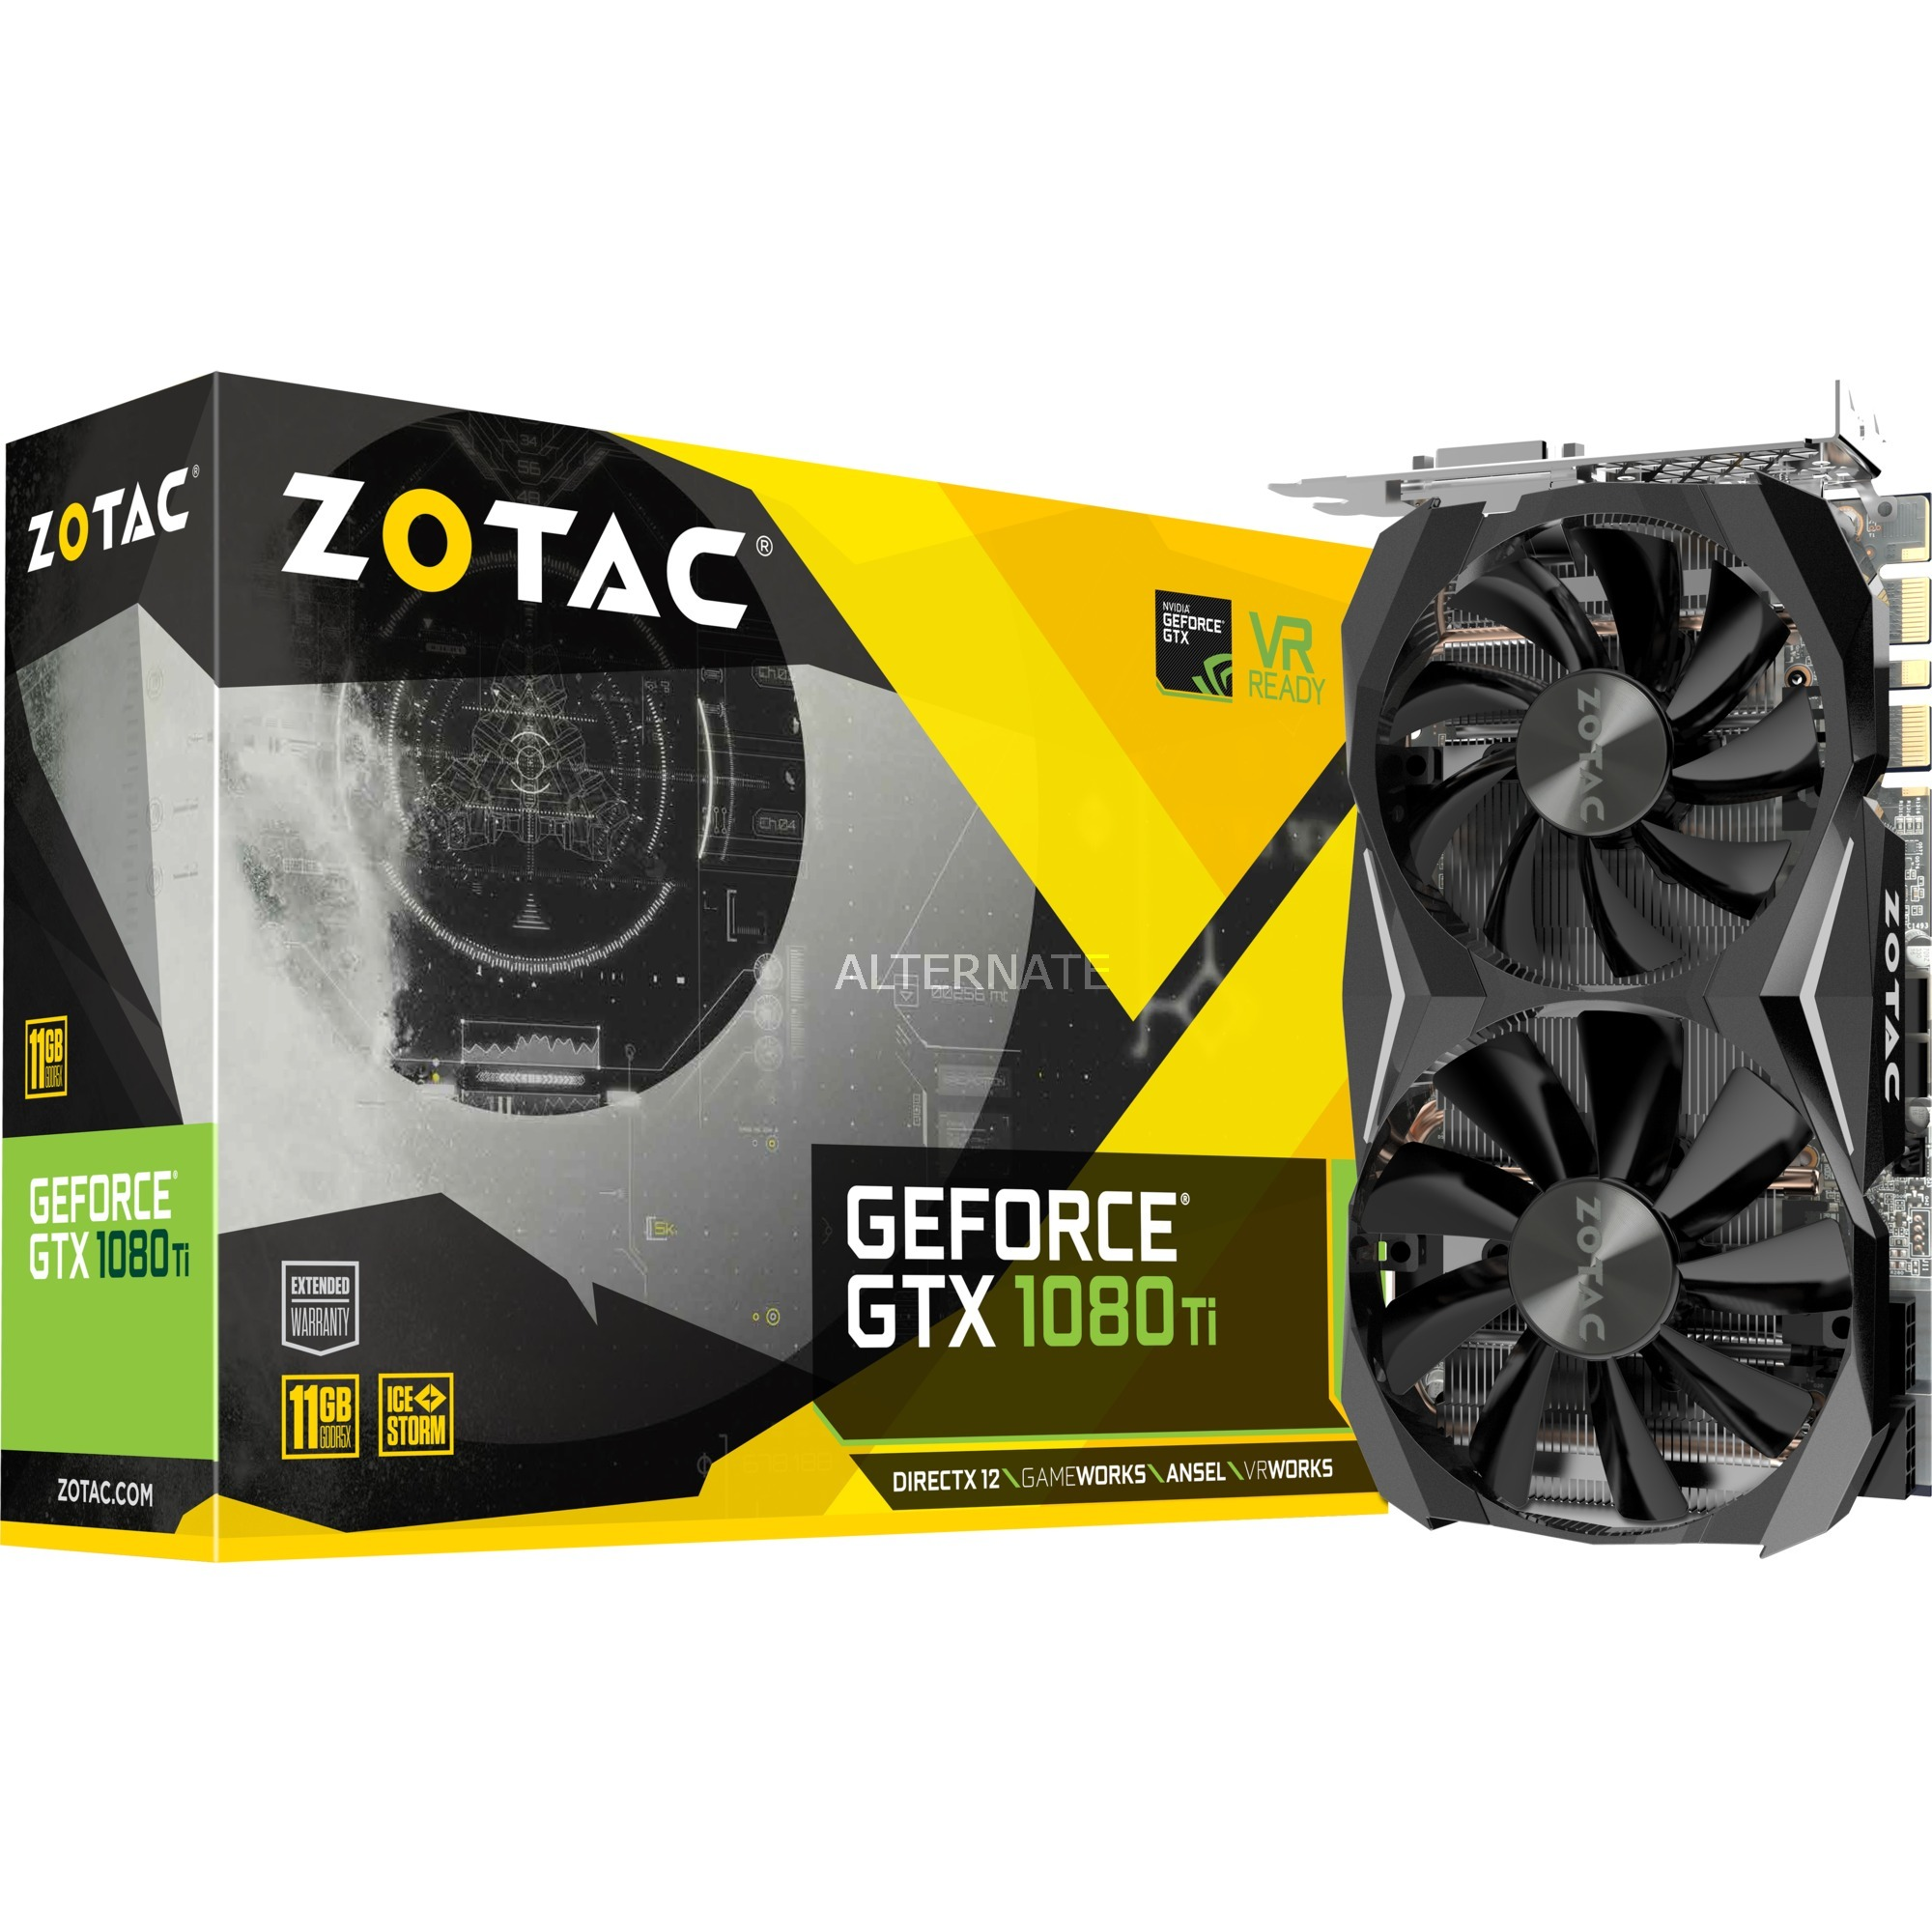 GeForce GTX 1080 Ti Mini GeForce GTX 1080 Ti 11Go GDDR5X, Carte graphique